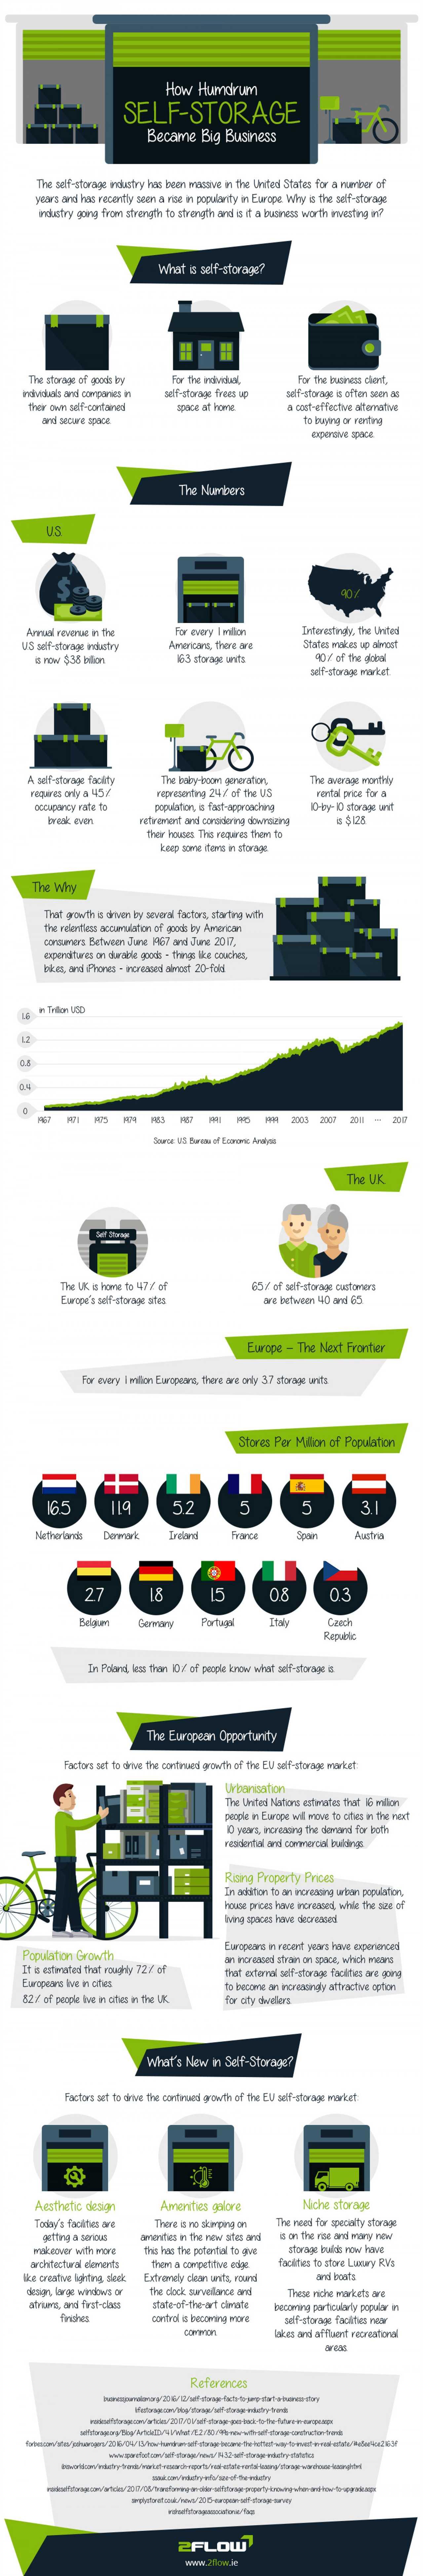 How humdrum self storage became big business infographic